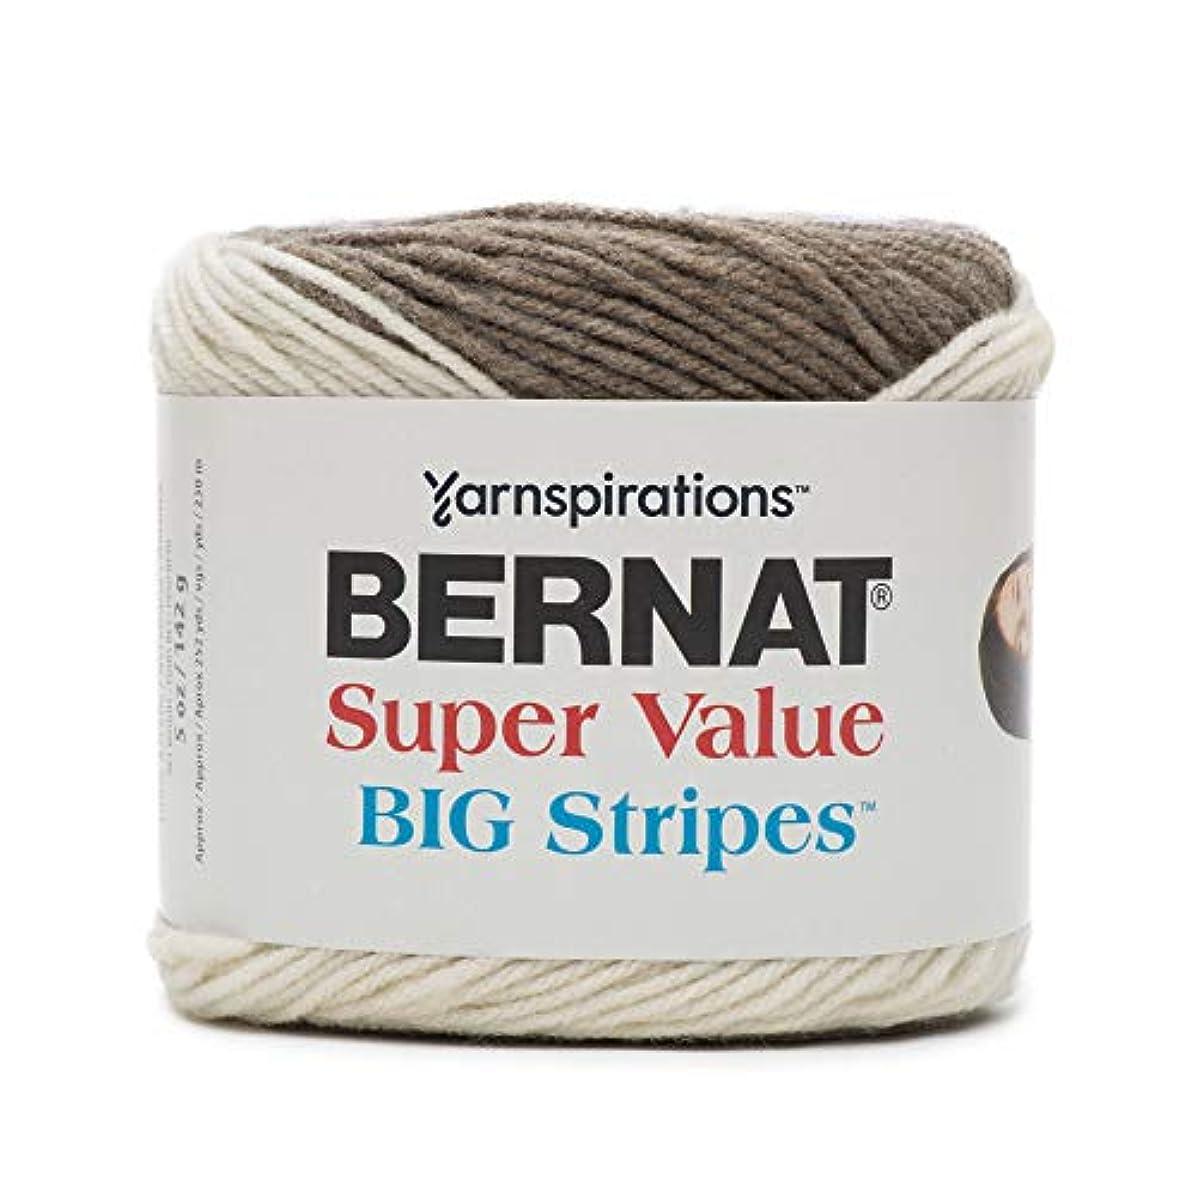 Bernat Super Value Big Stripes Yarn, 5 oz, Chambray, 1 Ball